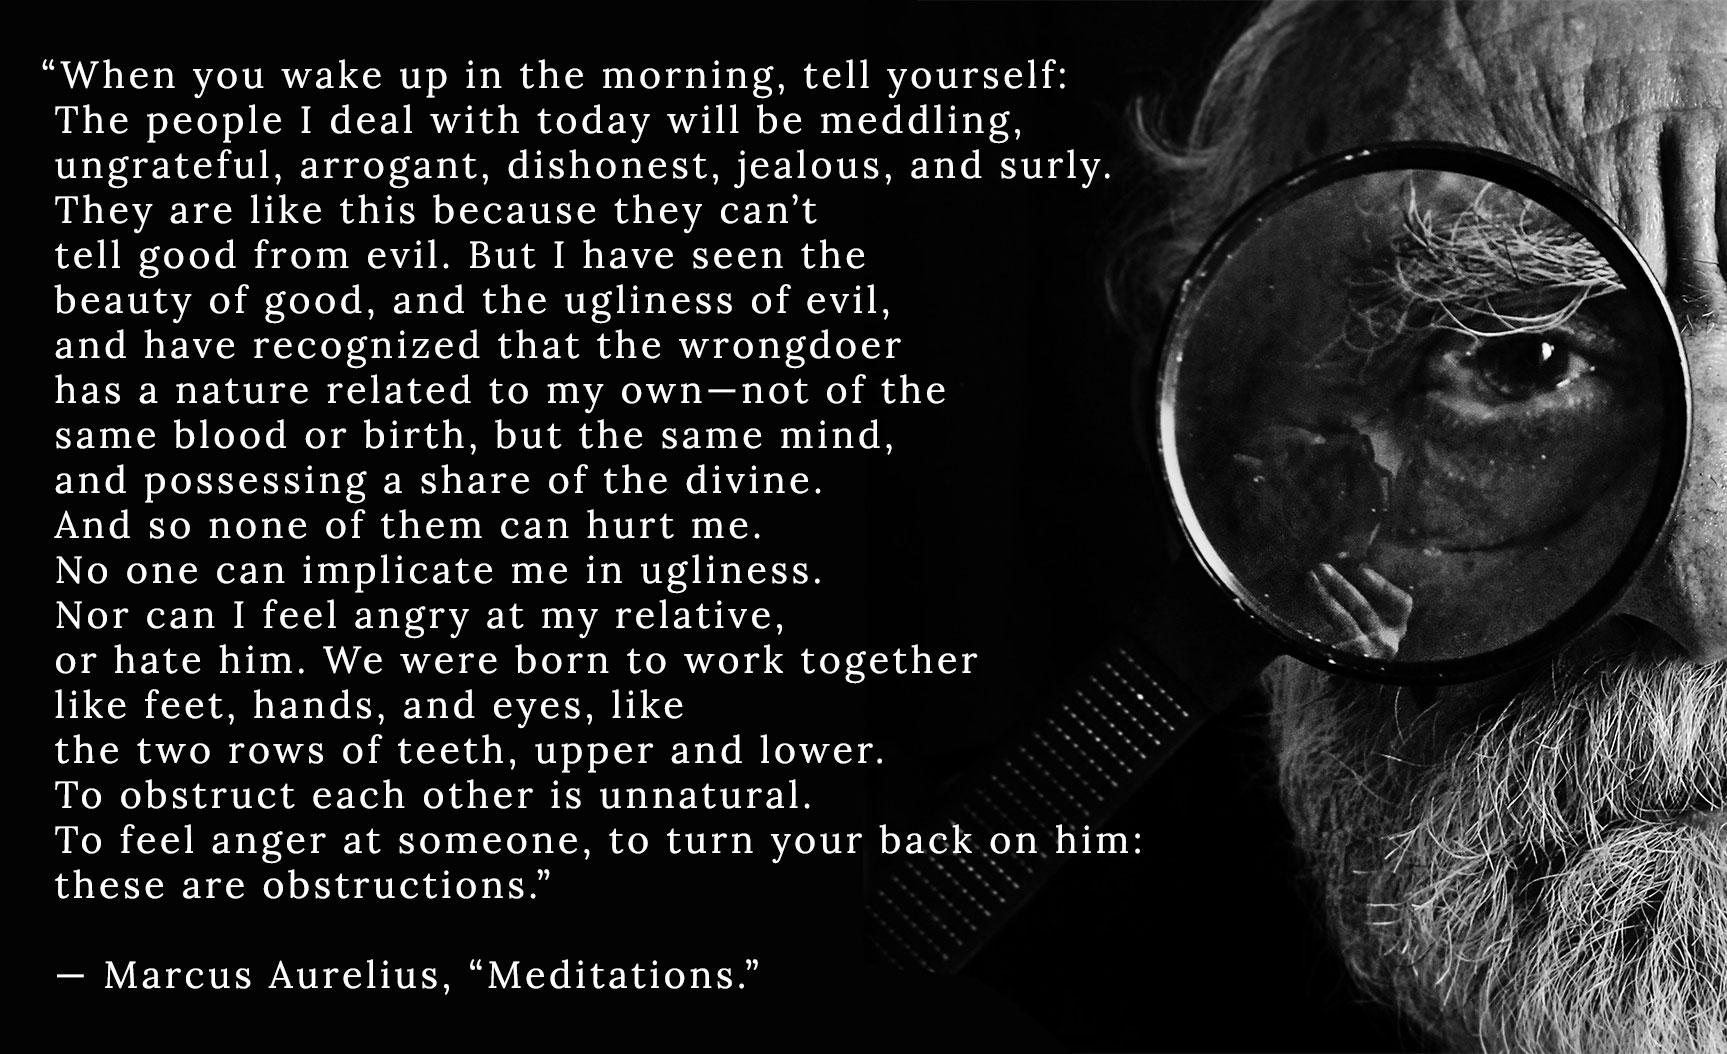 Marcus Aurelus Begin Each Day By Telling Yourself.jpg